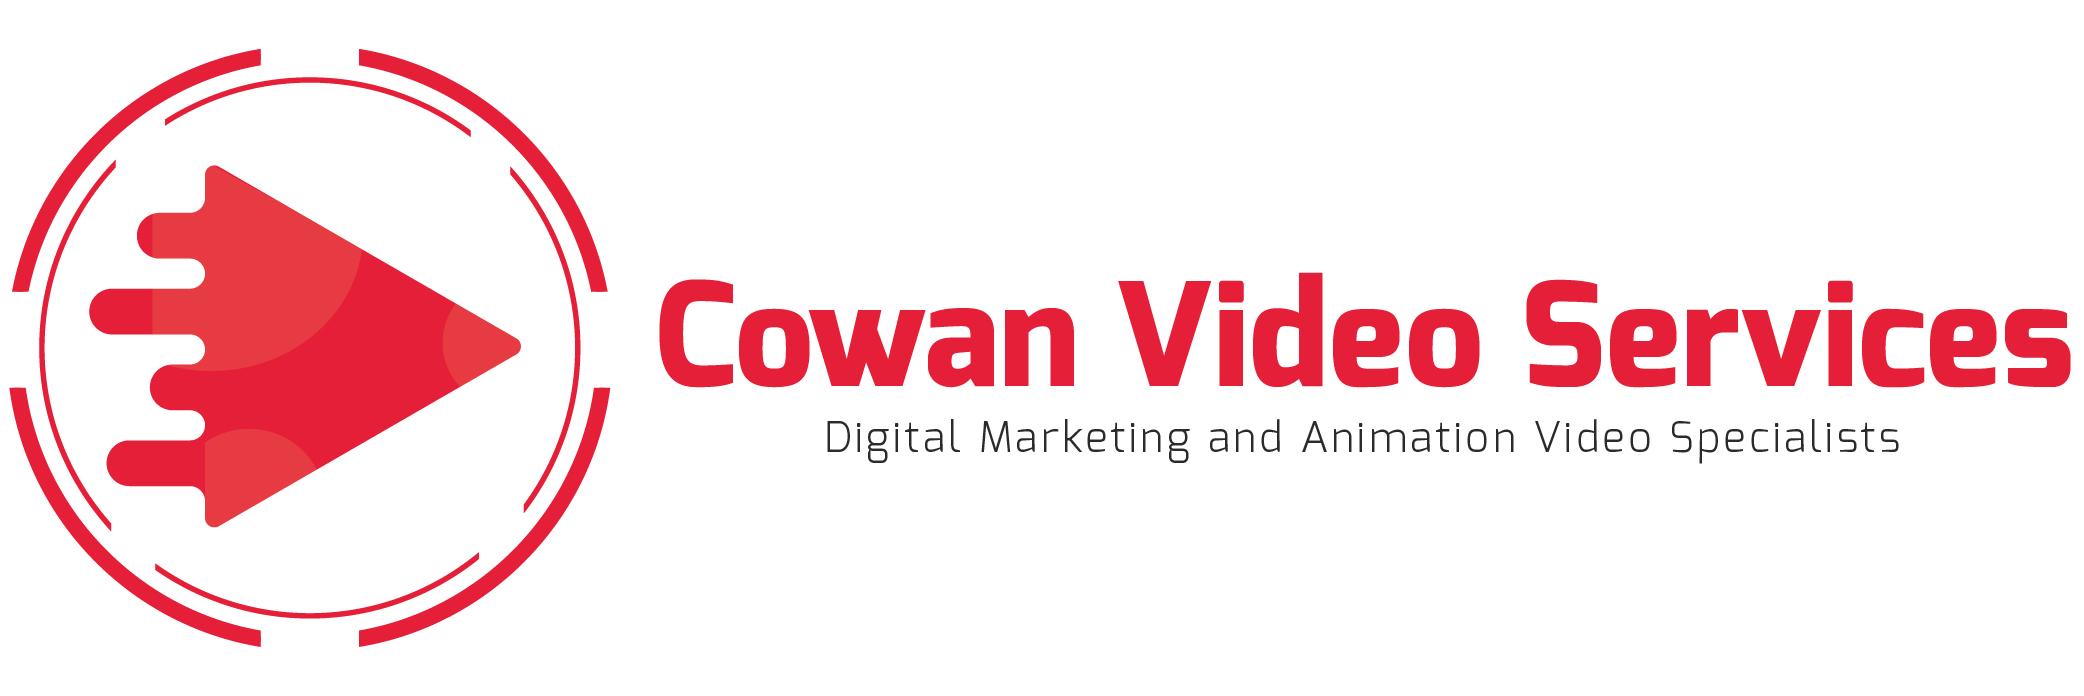 Cowan Video Services Video Place